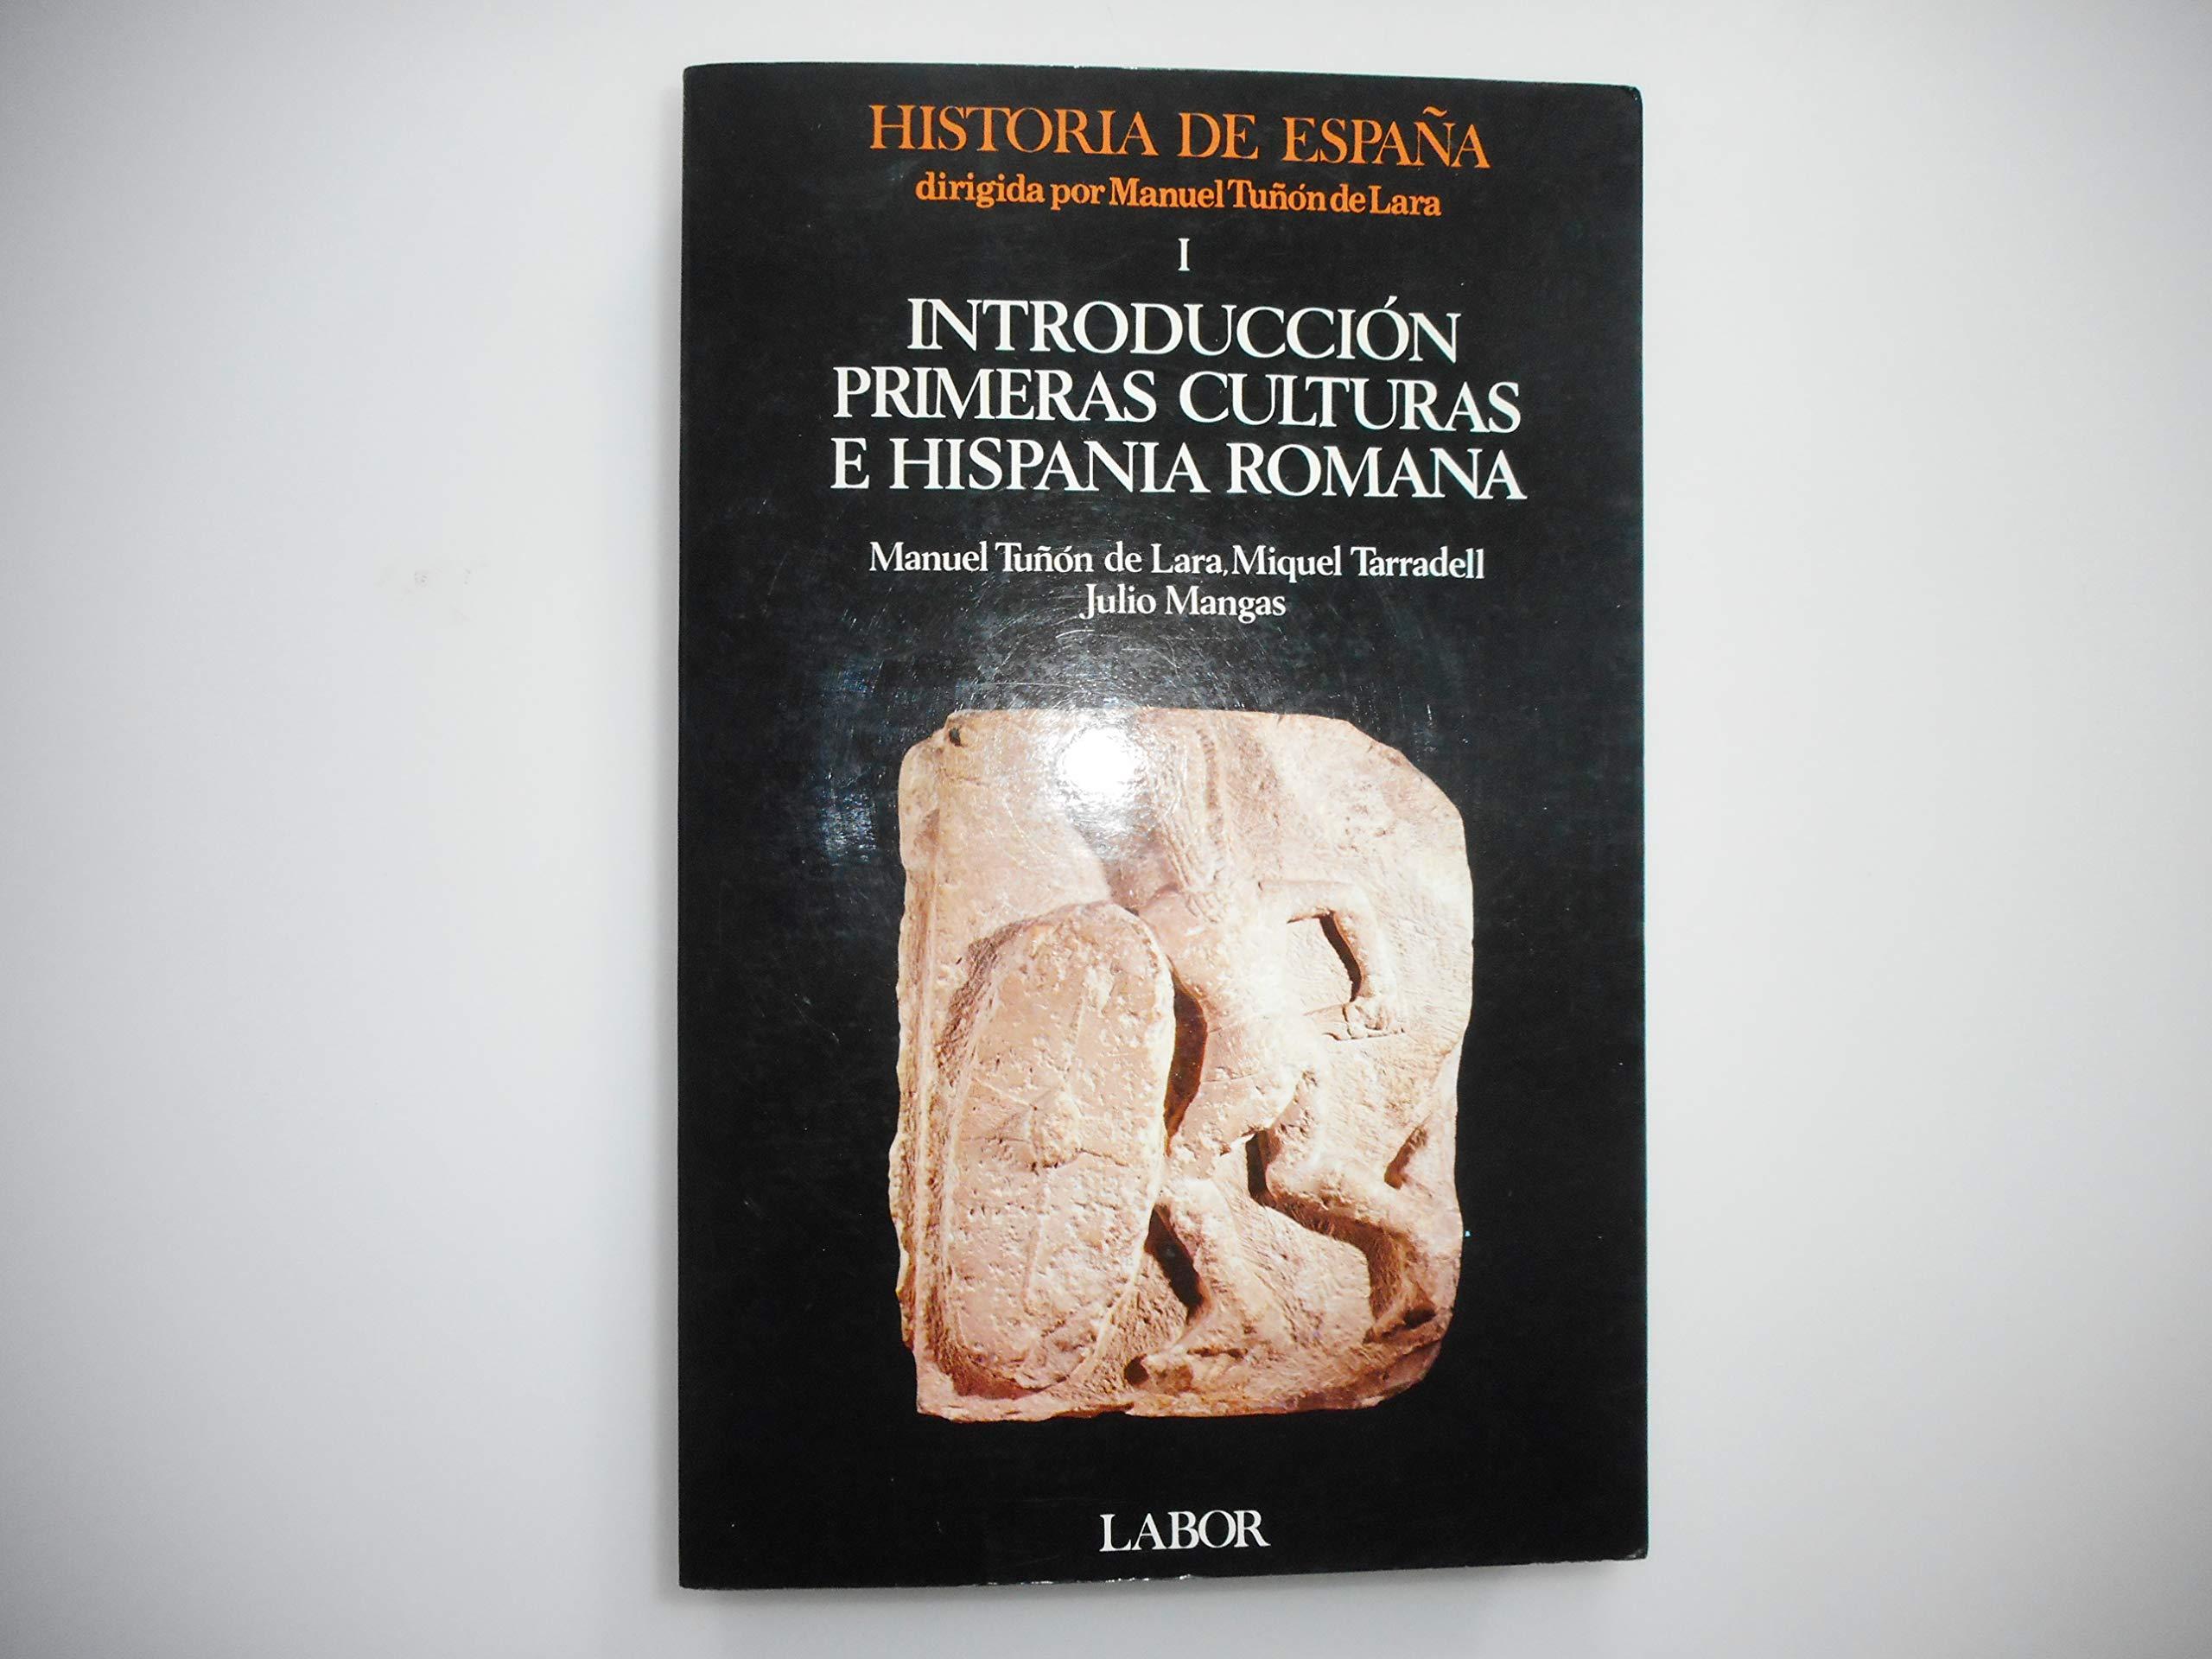 Introduccion, primeras culturas e hispania romana historia de España;: Amazon.es: Tuñon De Lara, Manuel, Tarradell,: Libros